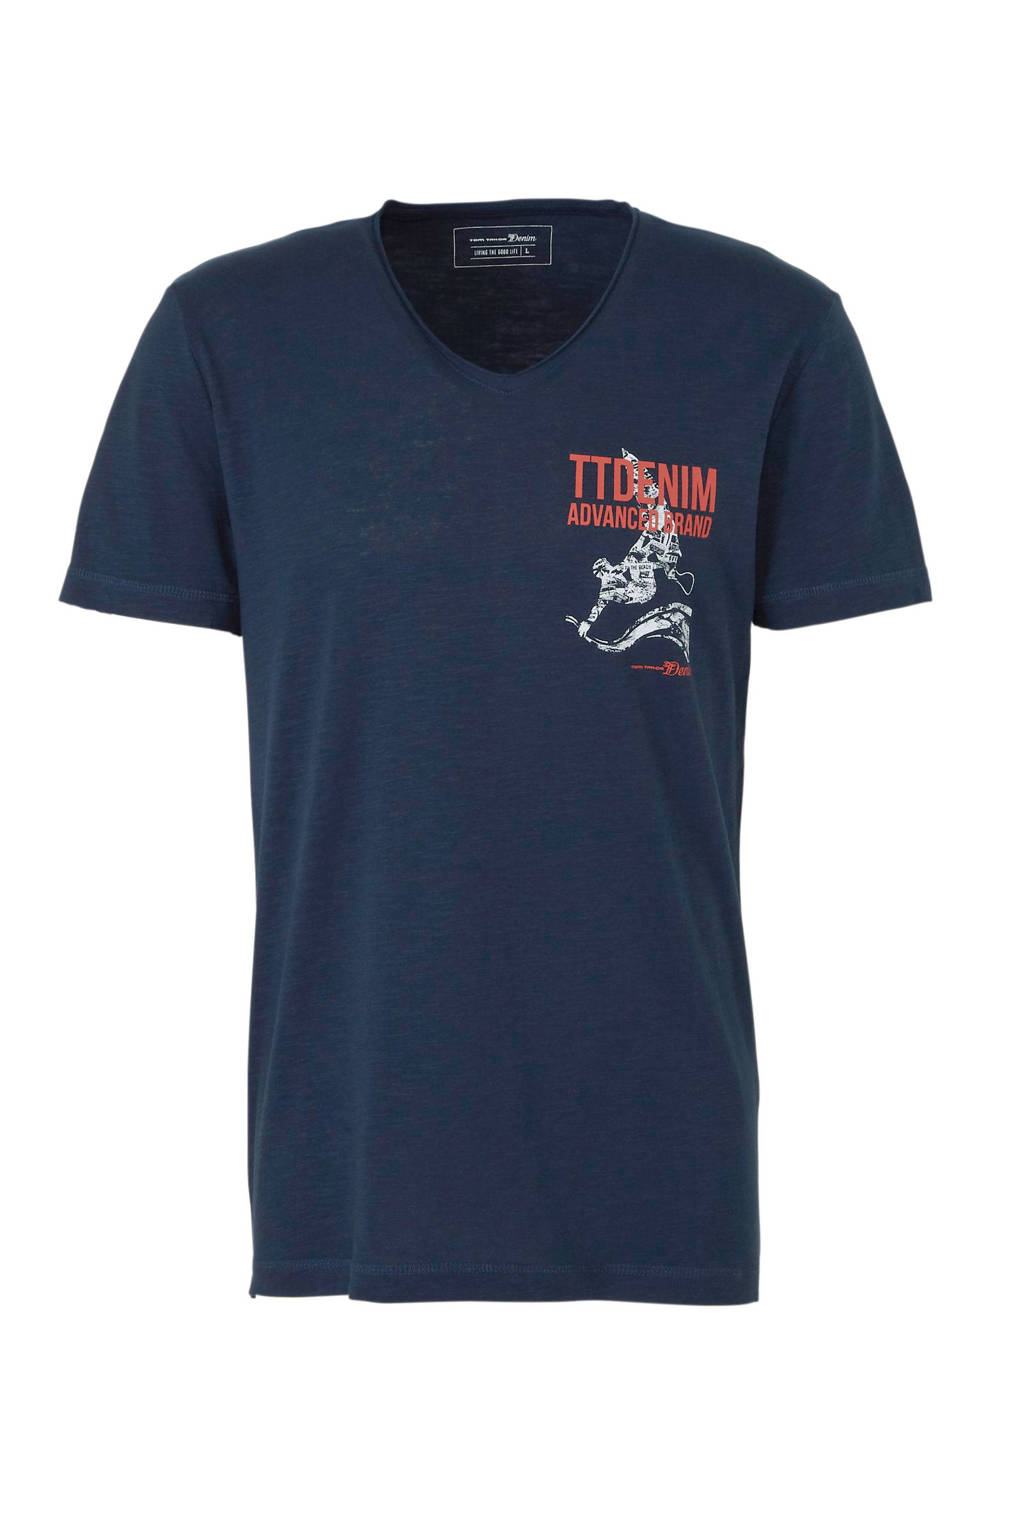 Tom Tailor Denim T-shirt met printopdruk, Donkerblauw